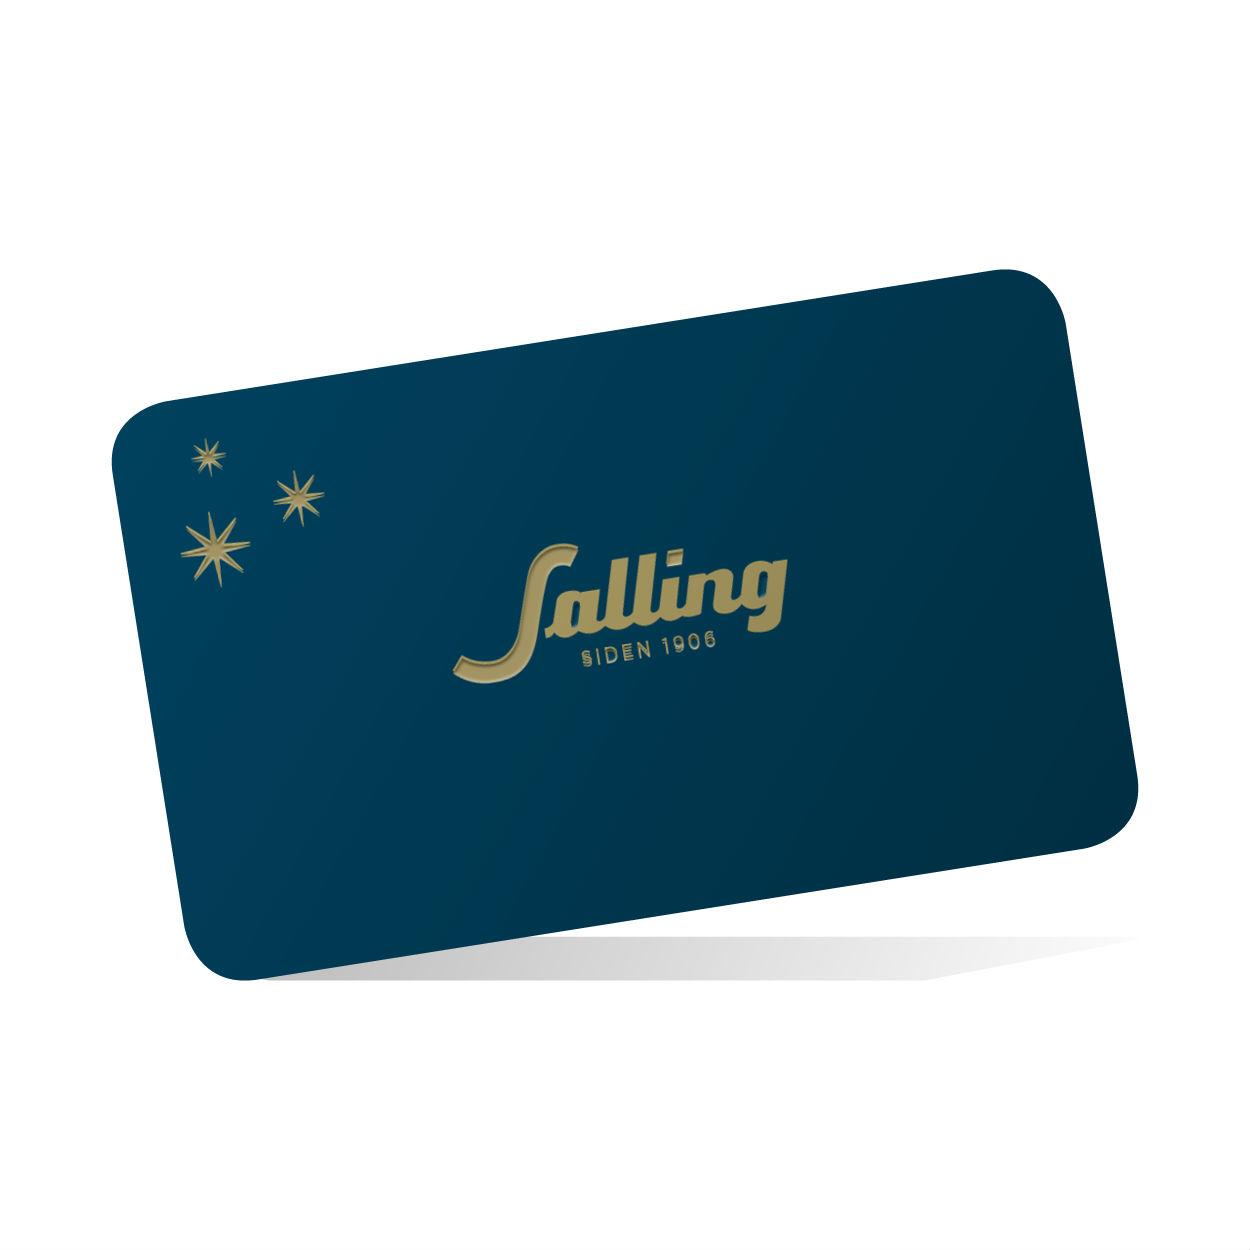 Salling gavekort - 2500 kr